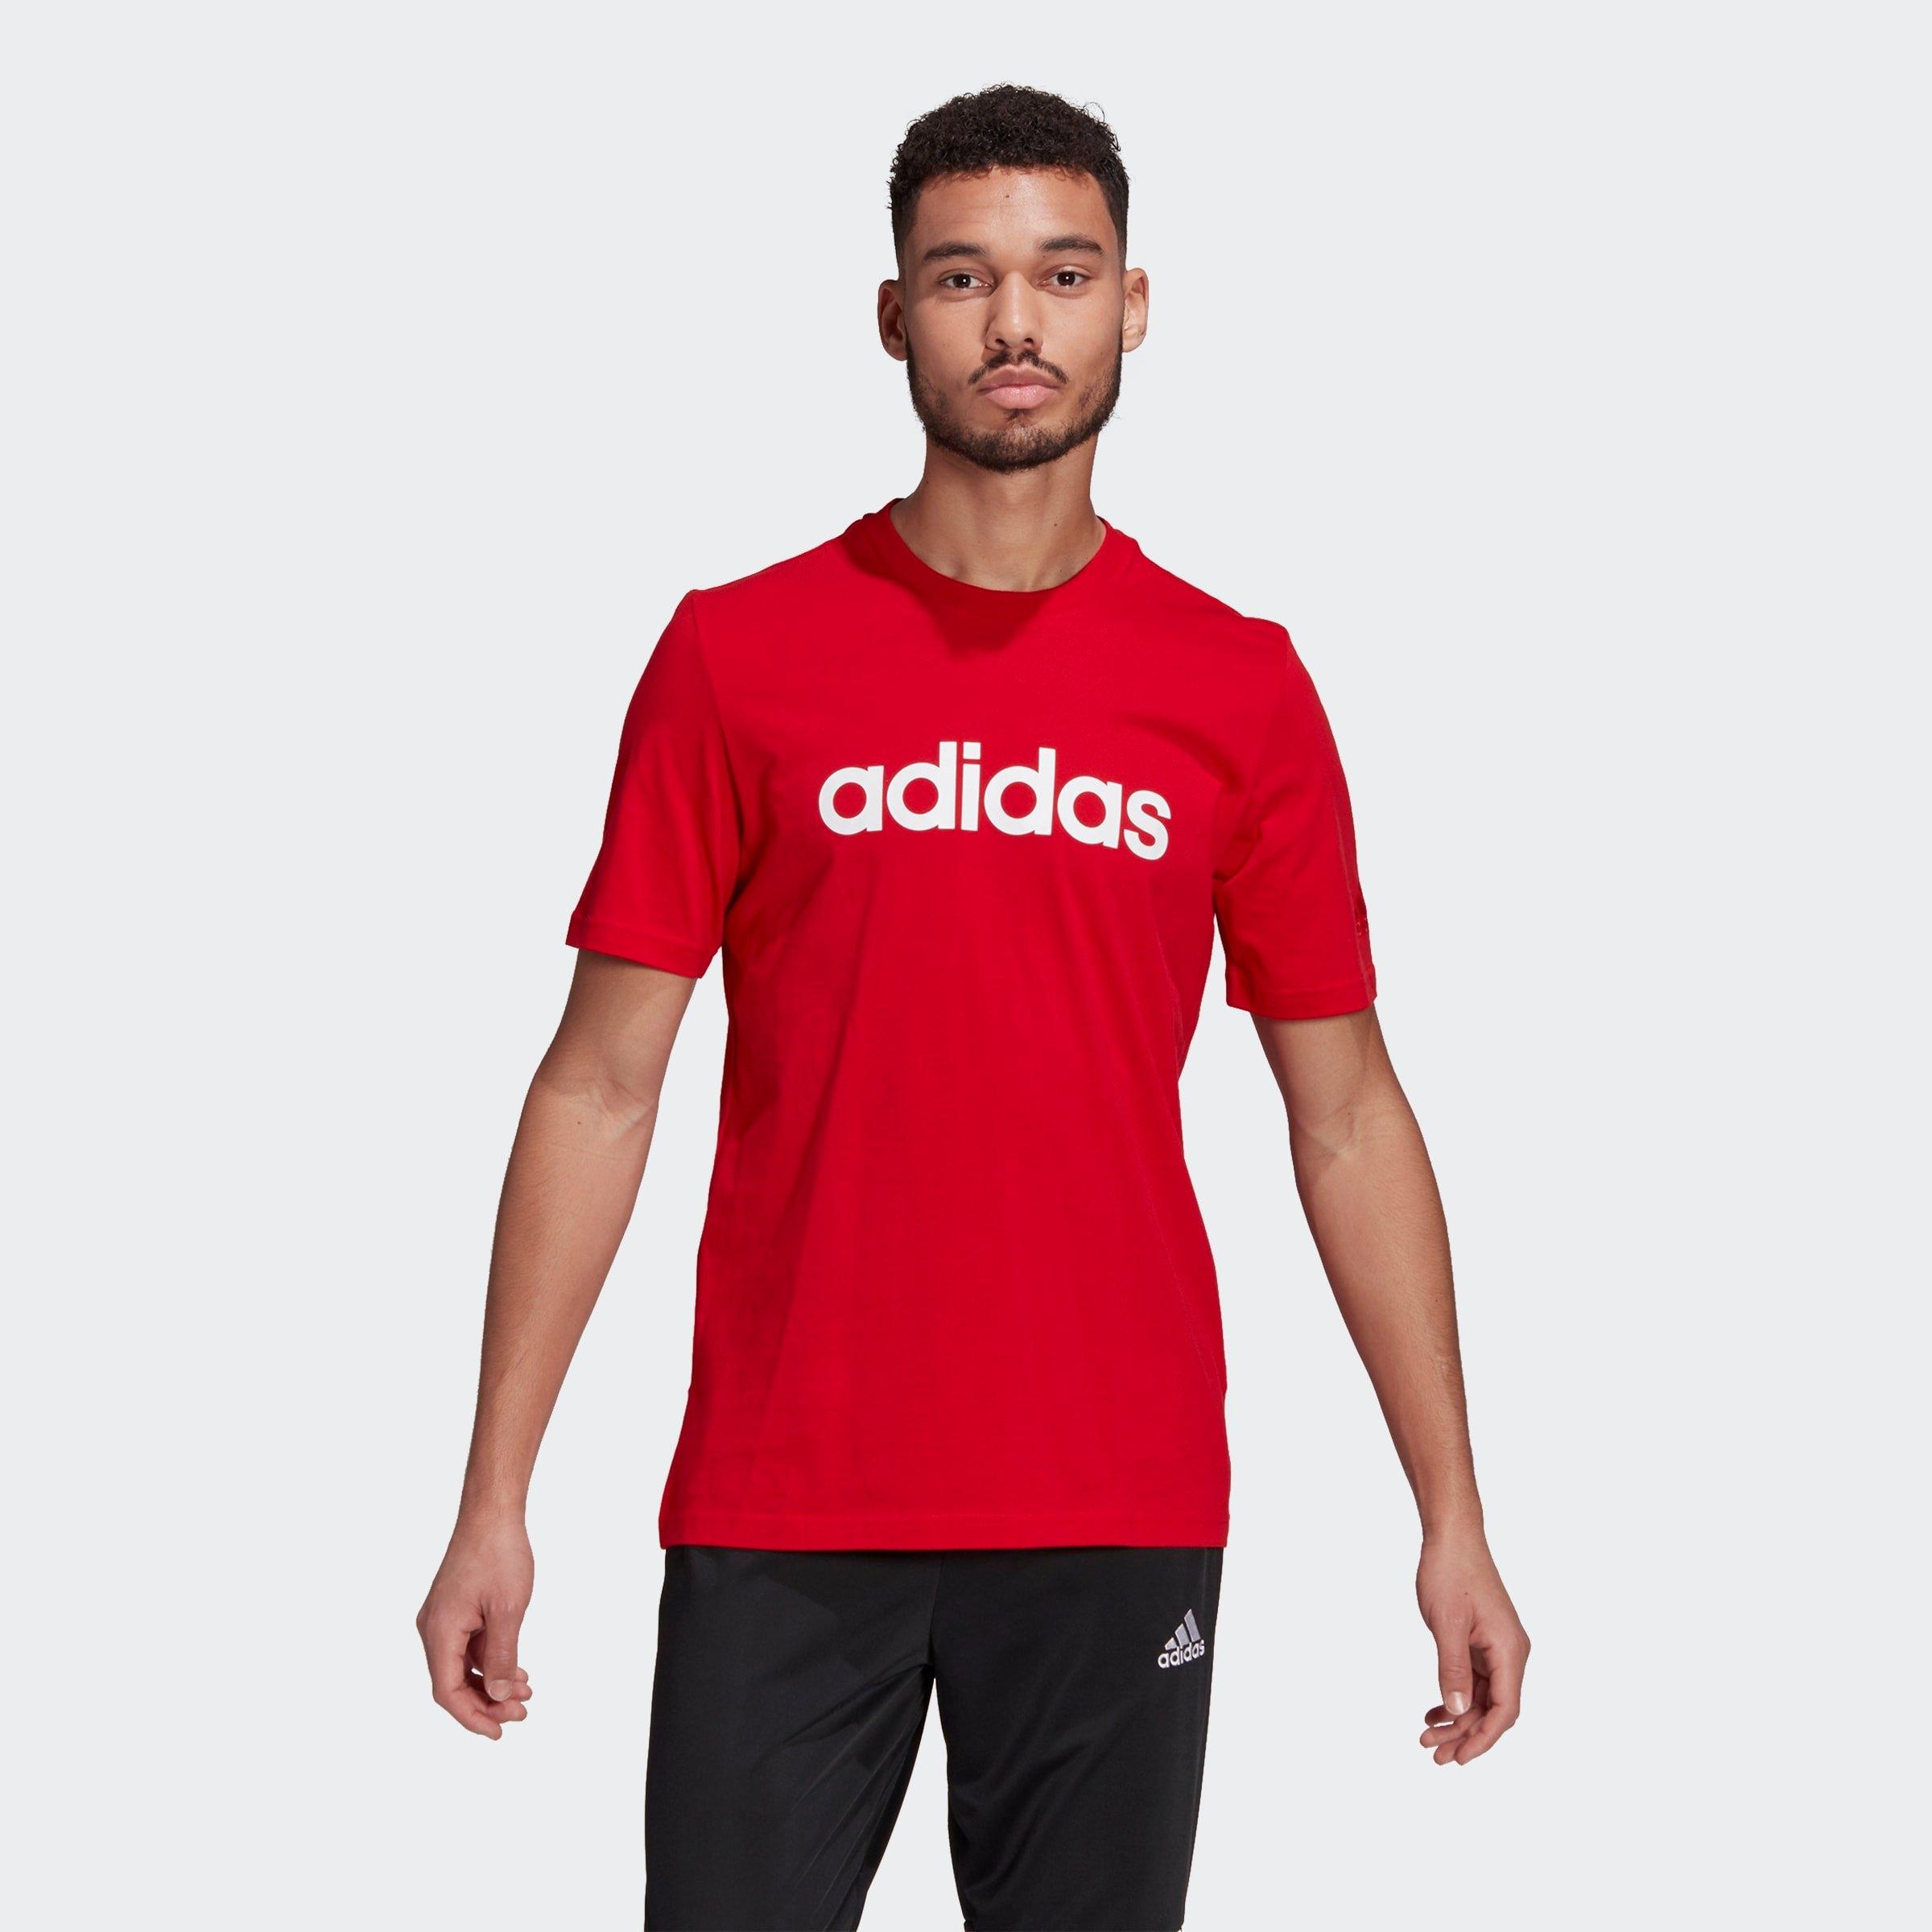 adidas Performance T-shirt ESSENTIALS T-SHIRT goedkoop op otto.nl kopen